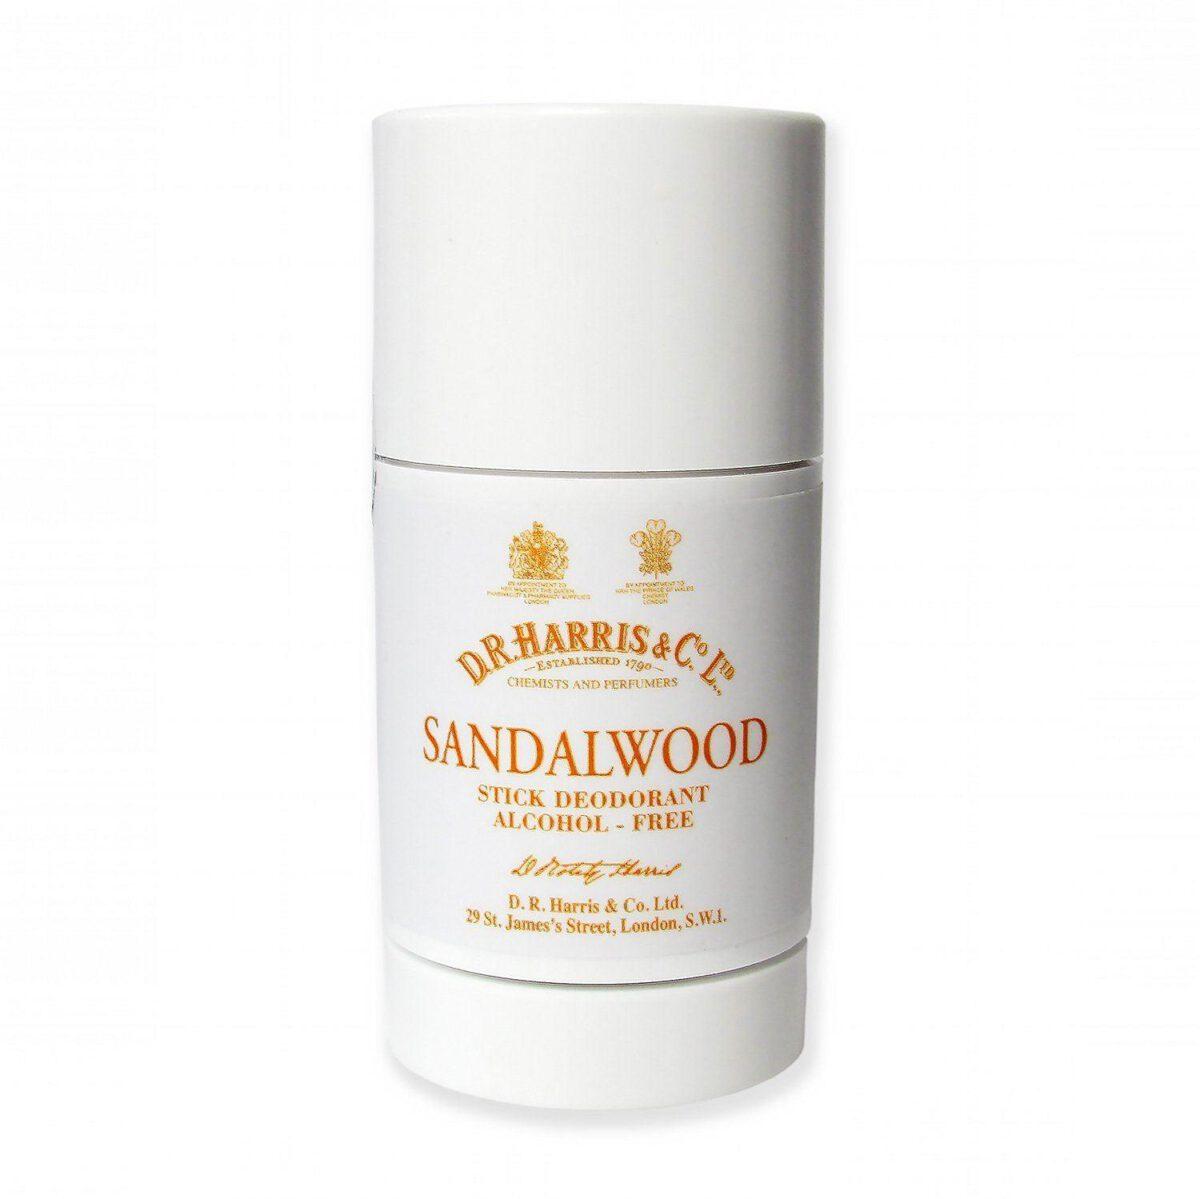 D R Harris Sandalwood Stick Deodorant 75g-0